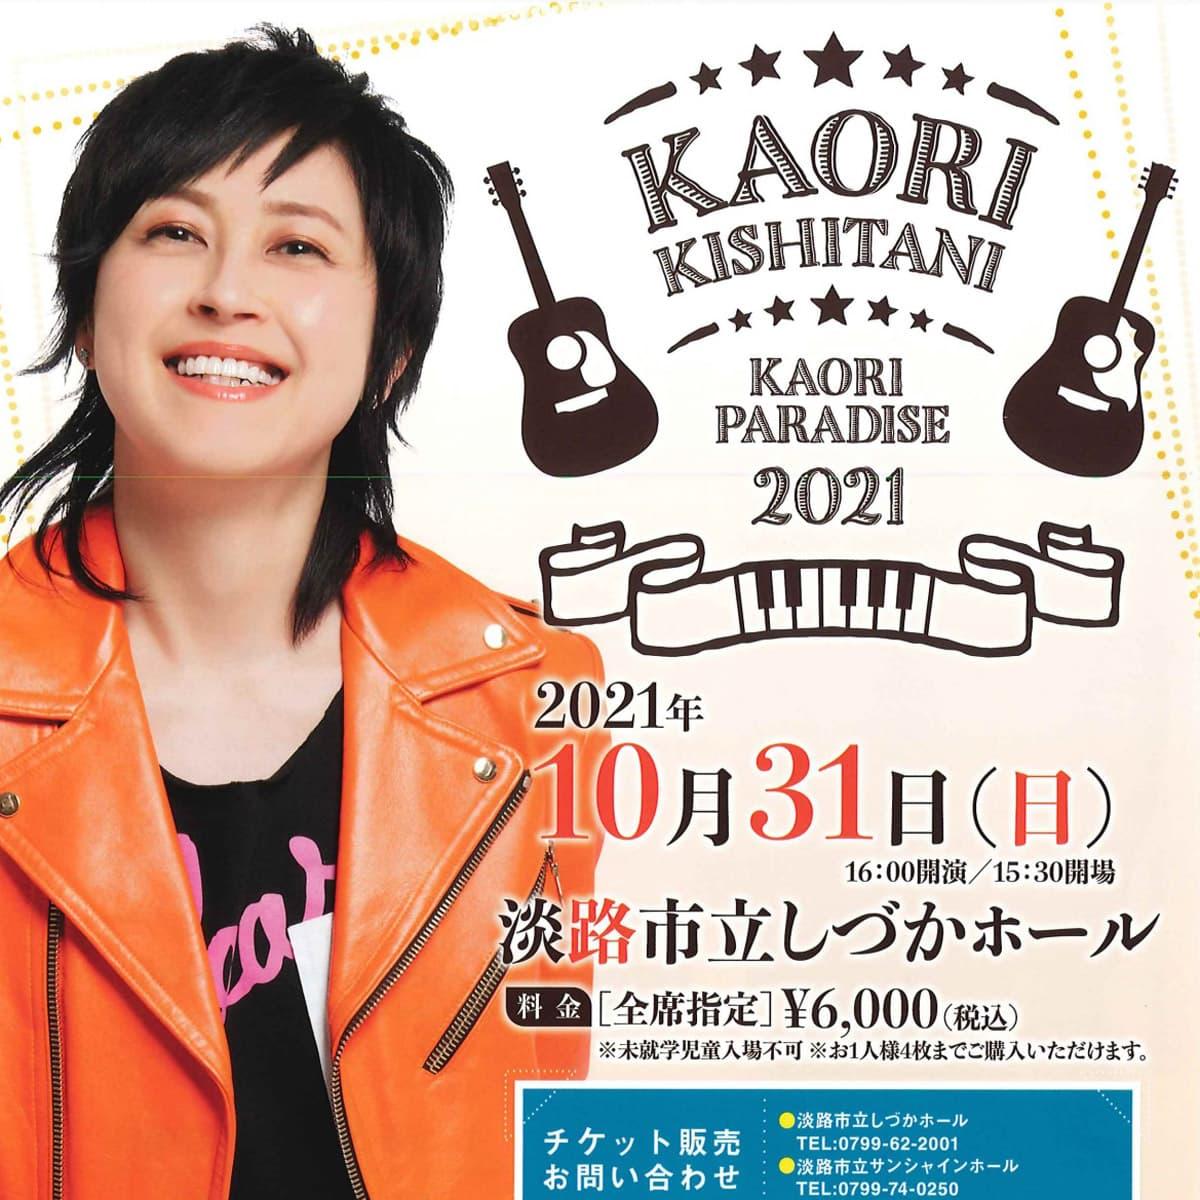 淡路島 岸谷香ライブ「KAORI PARADISE 2021」